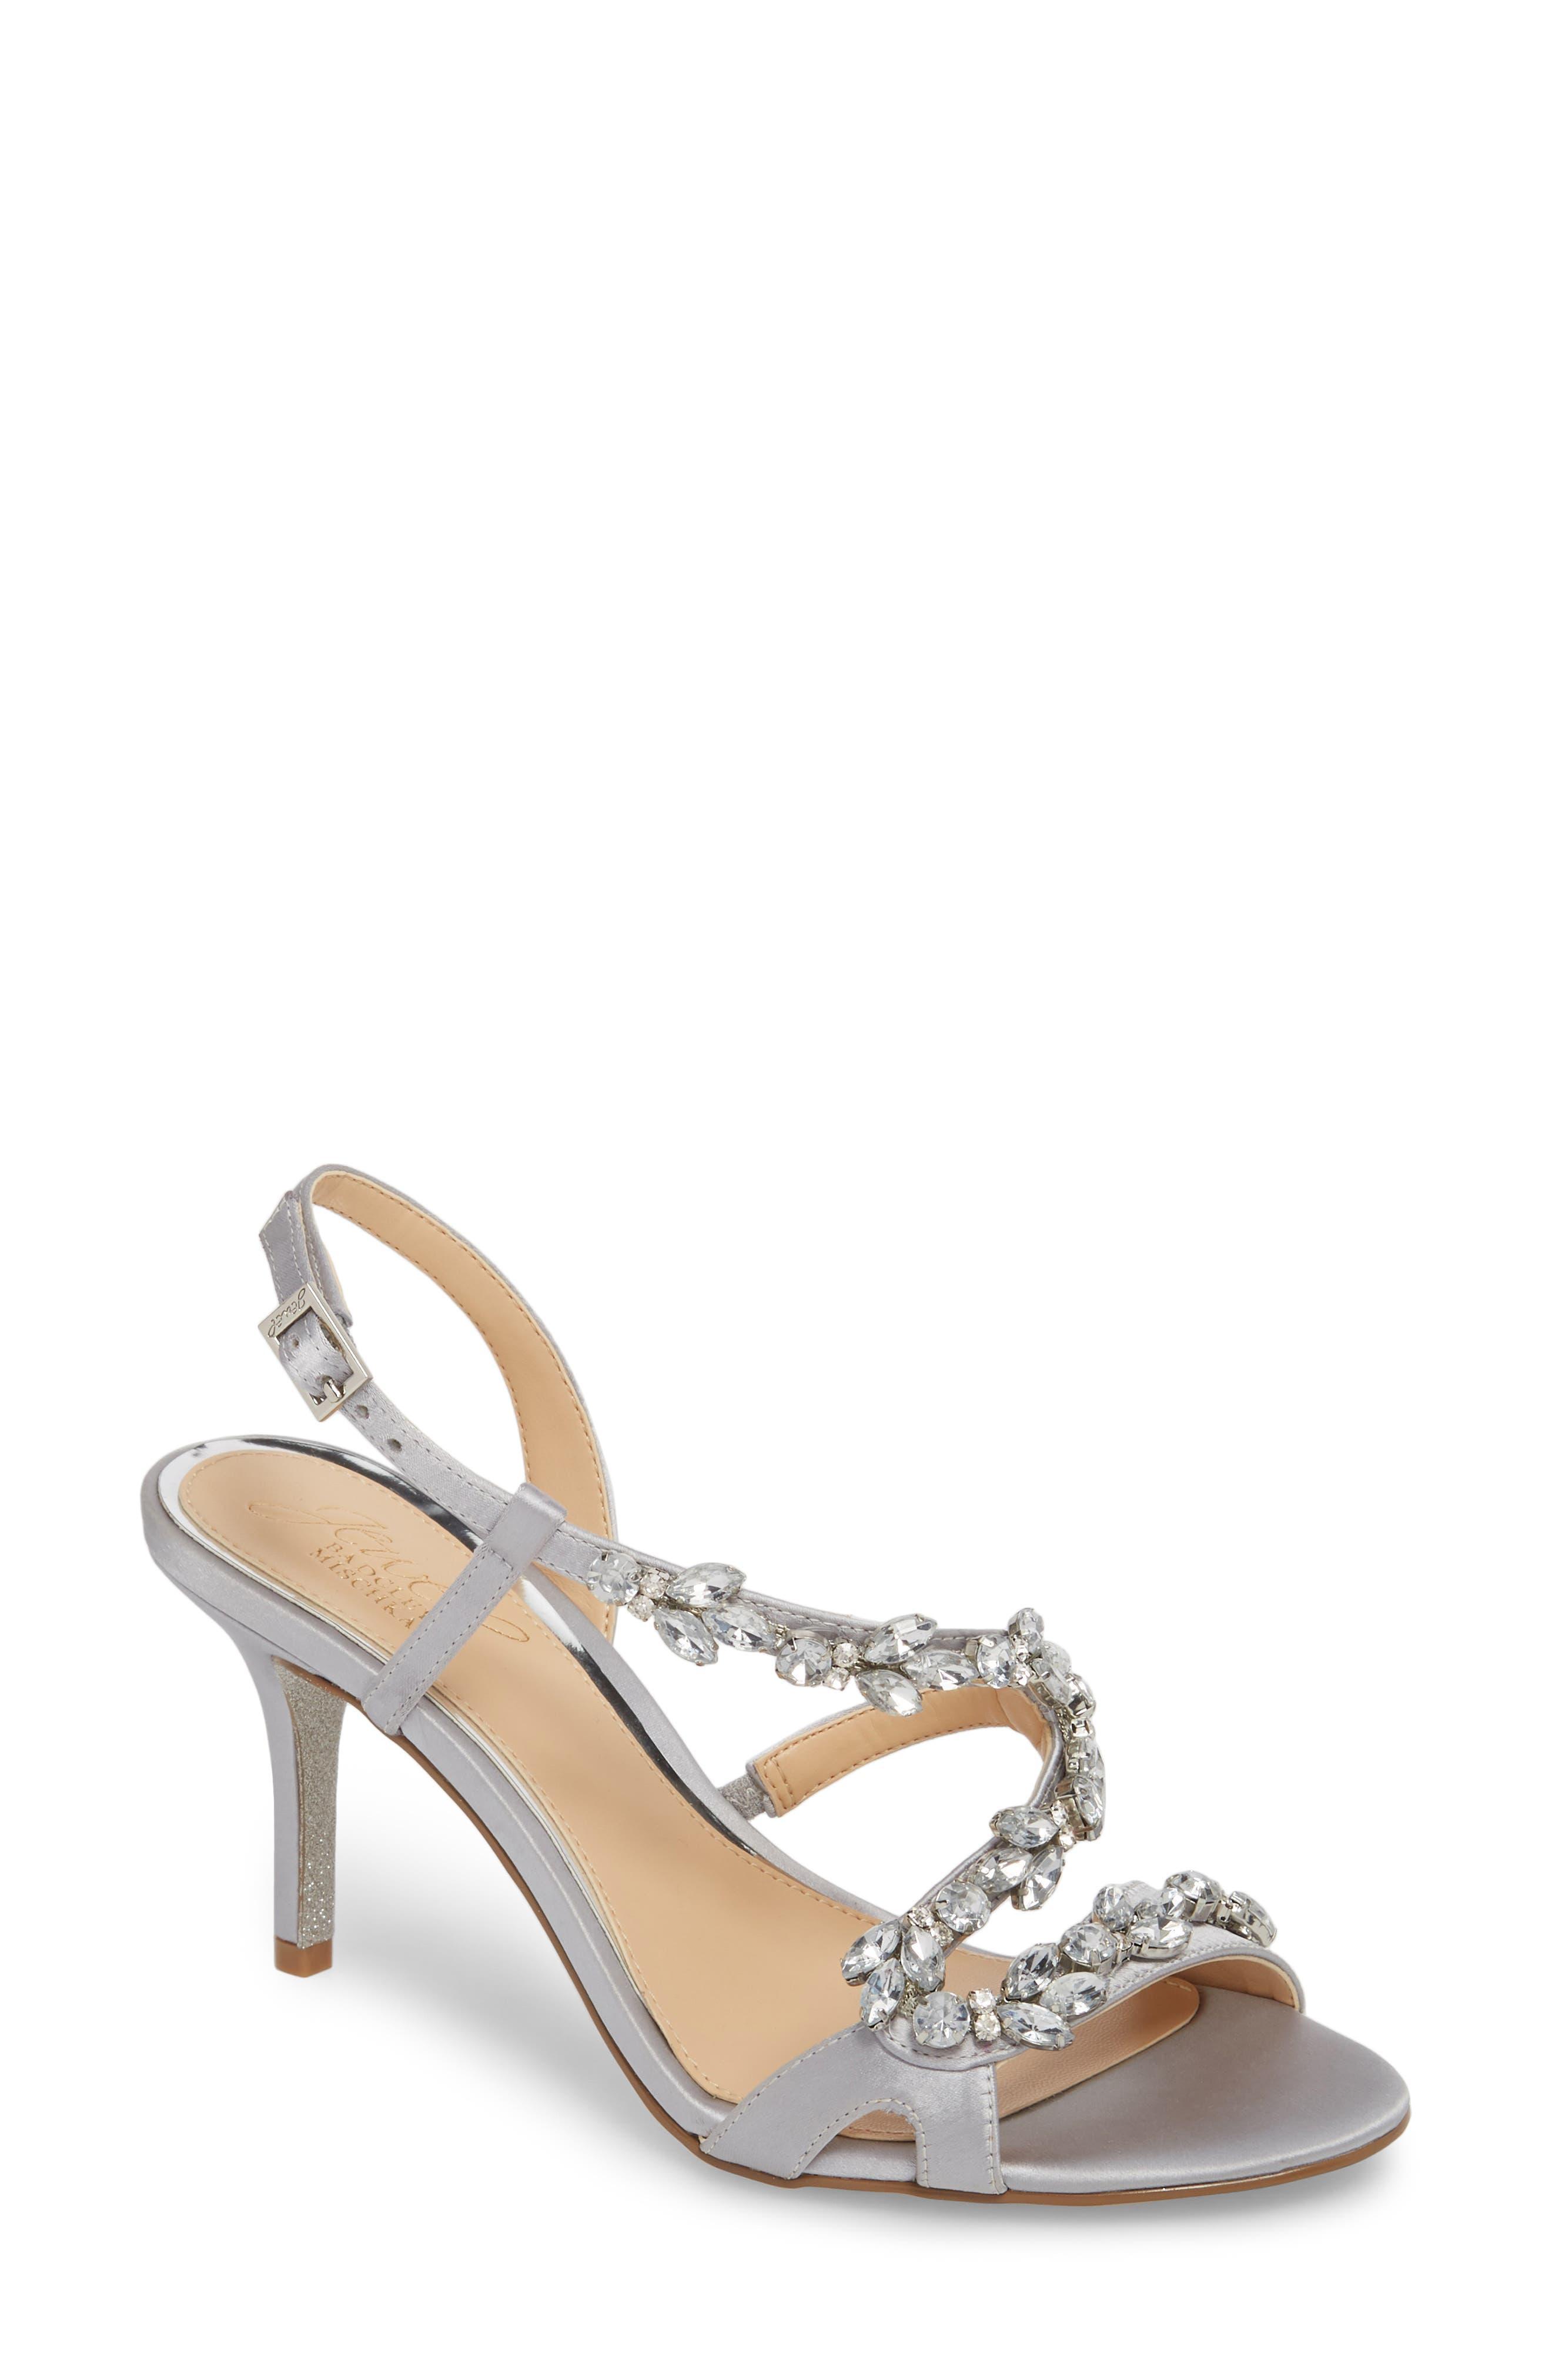 Badgley Mischka Ganet Embellished Sandal,                             Main thumbnail 1, color,                             Silver Satin